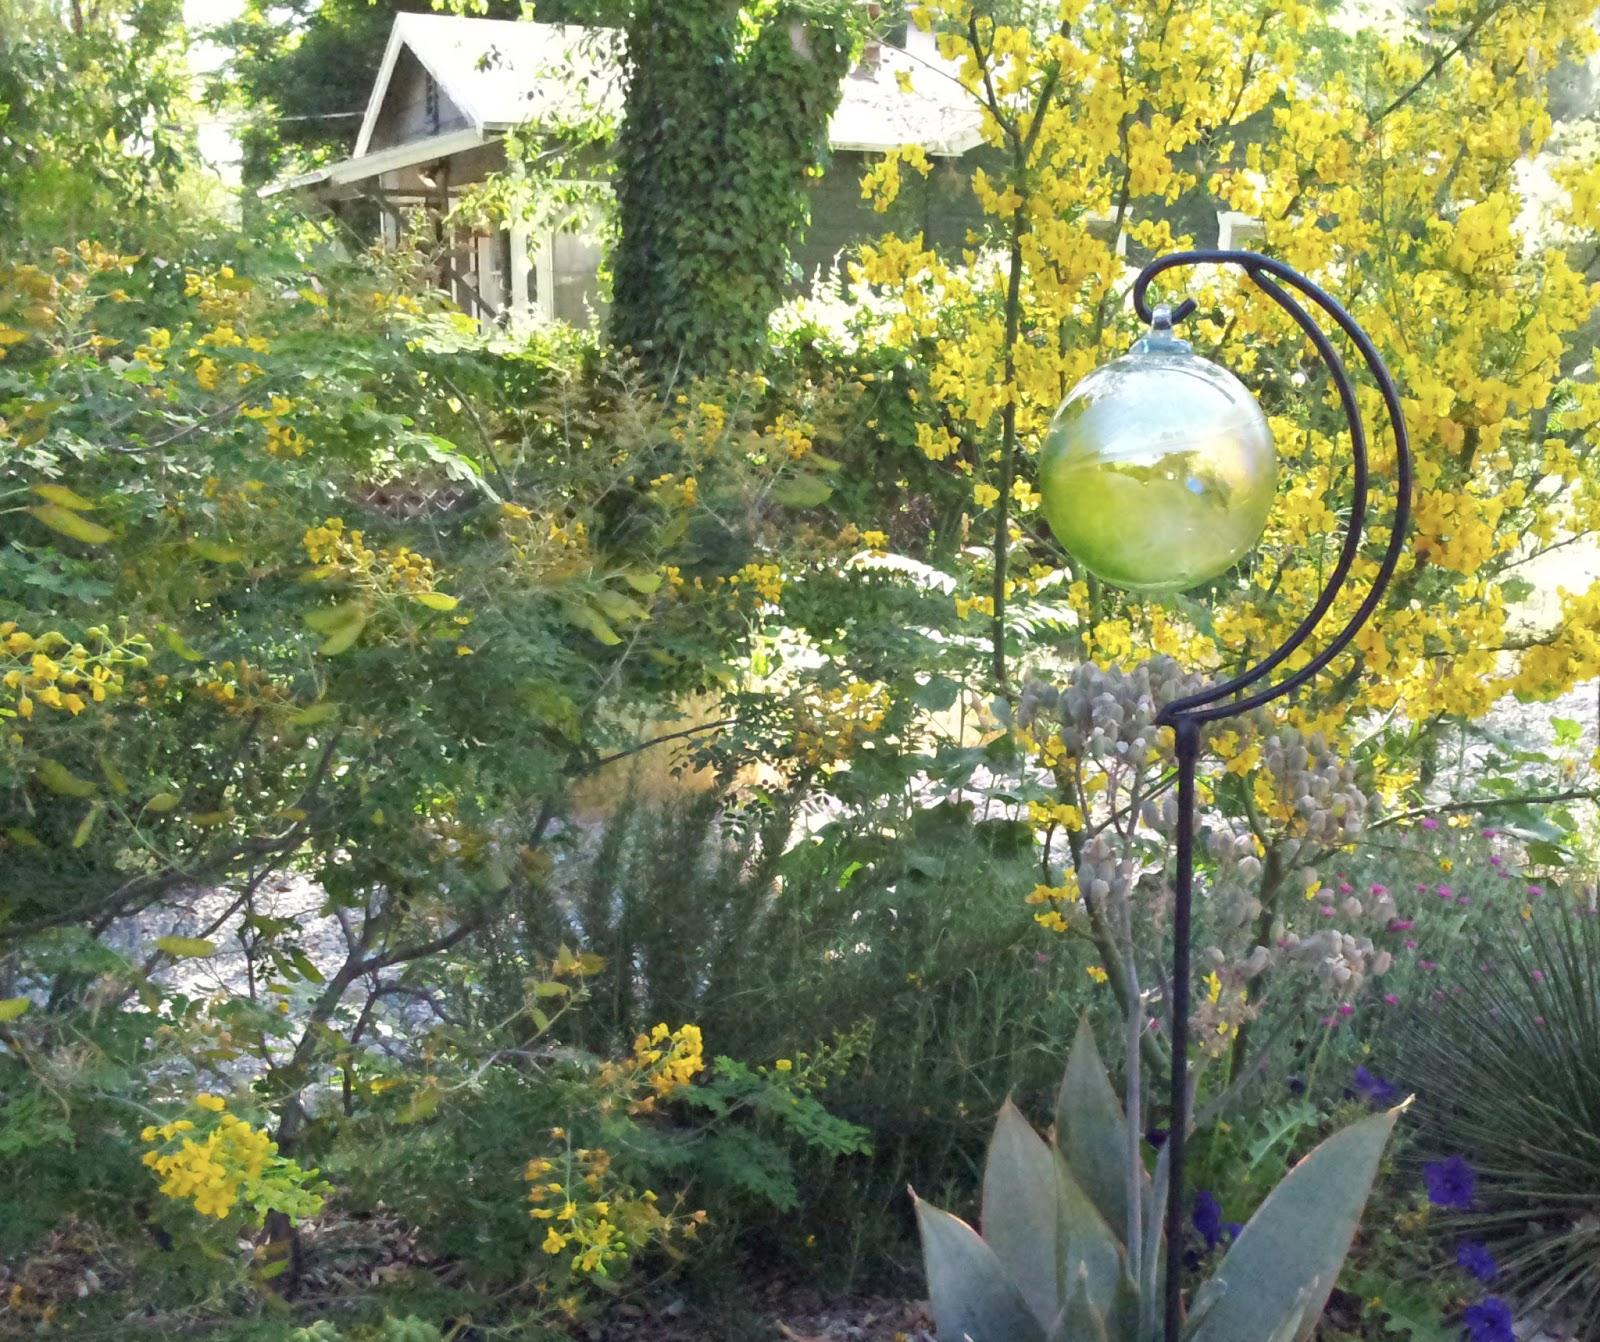 Merveilleux Adding Gazing Balls And Spheres To Your Garden